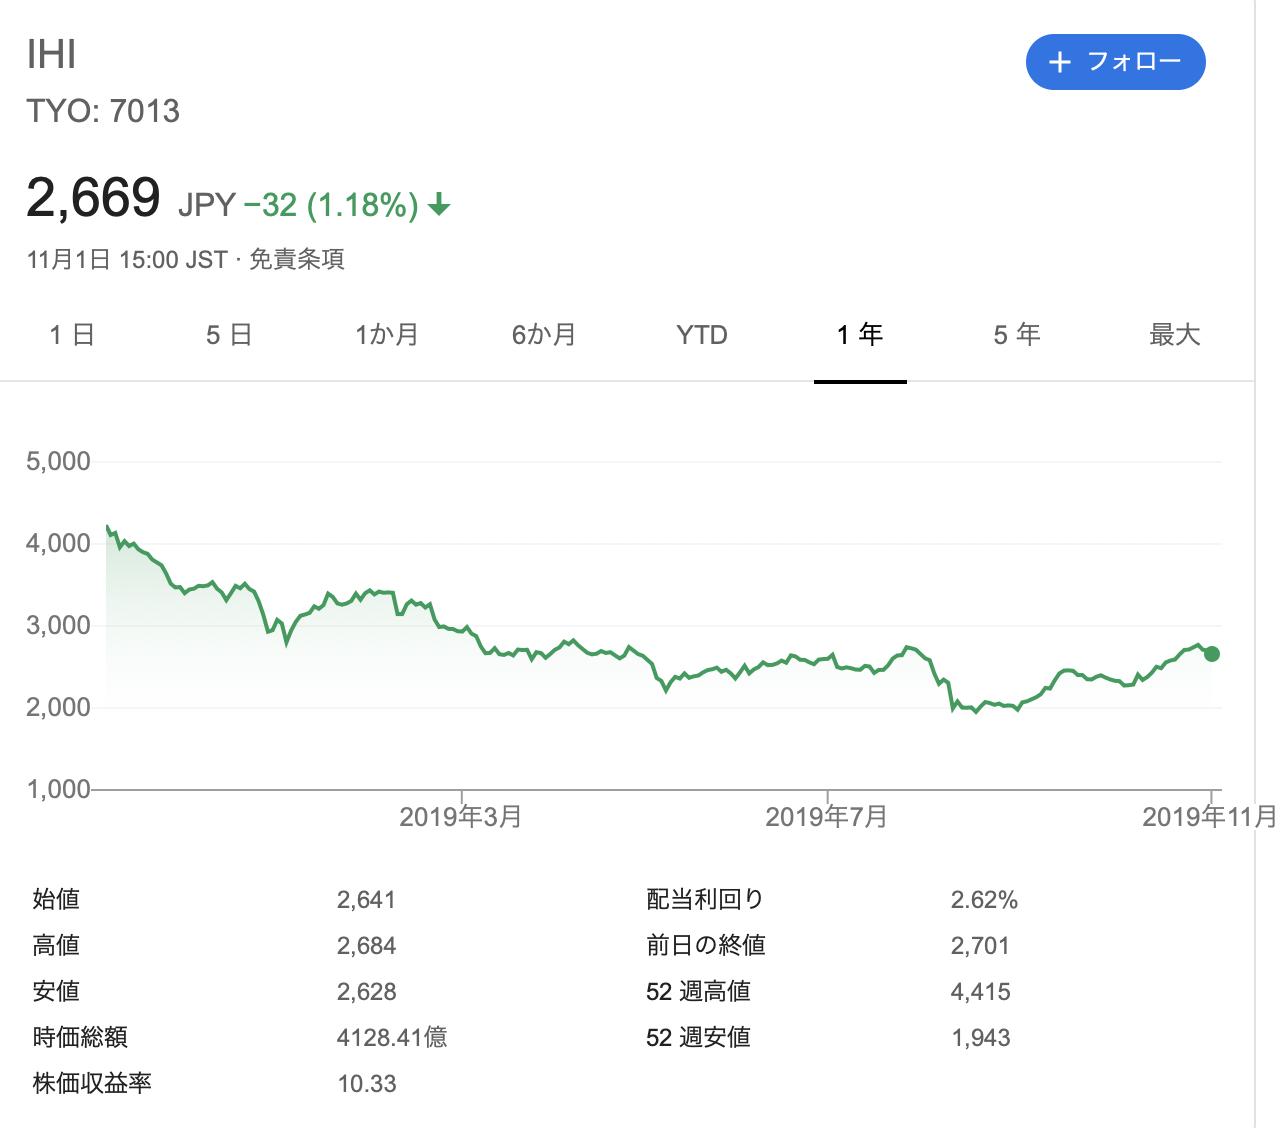 IHI 株価